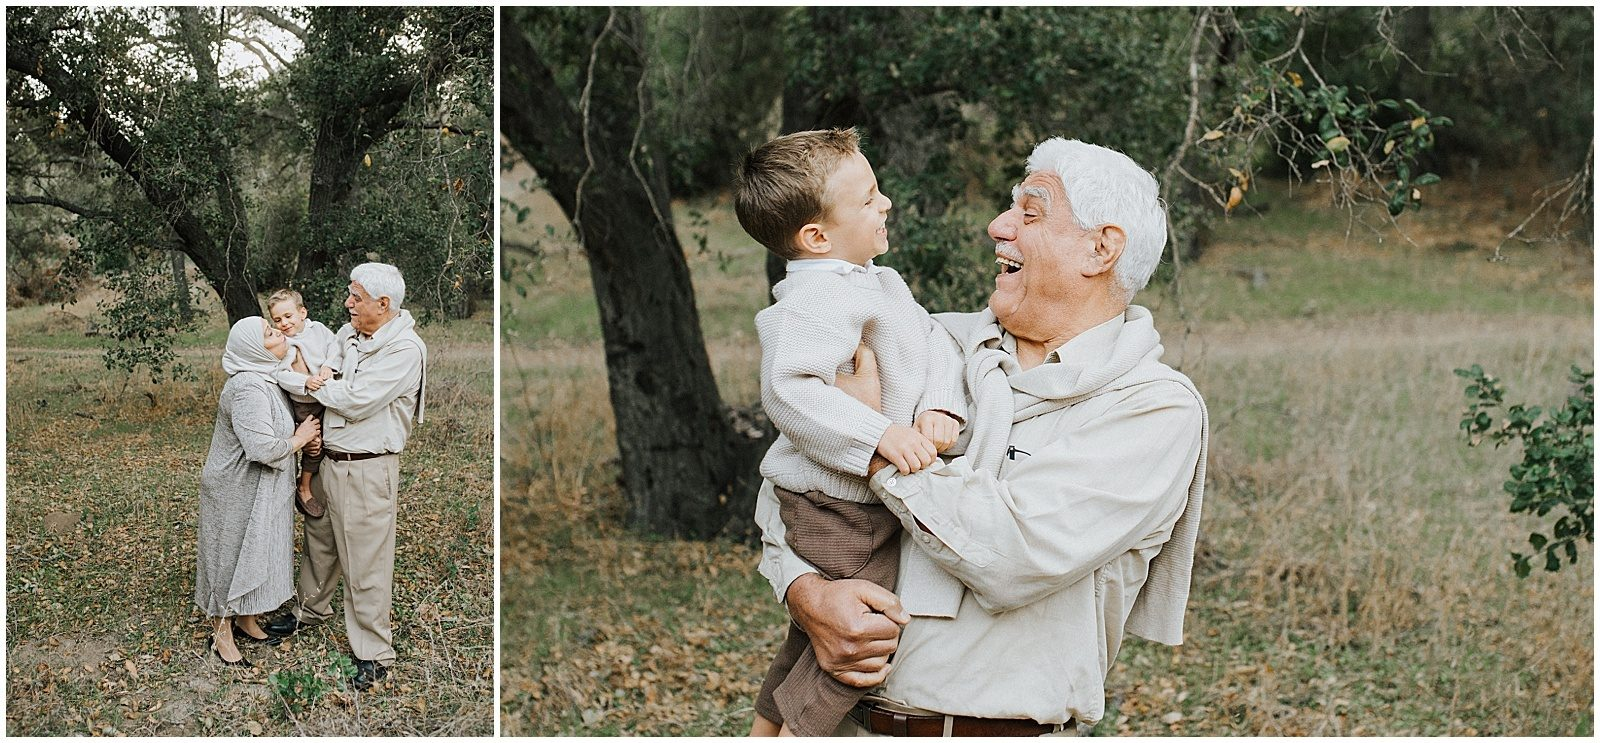 Orange County Extended Family Photographer 0427